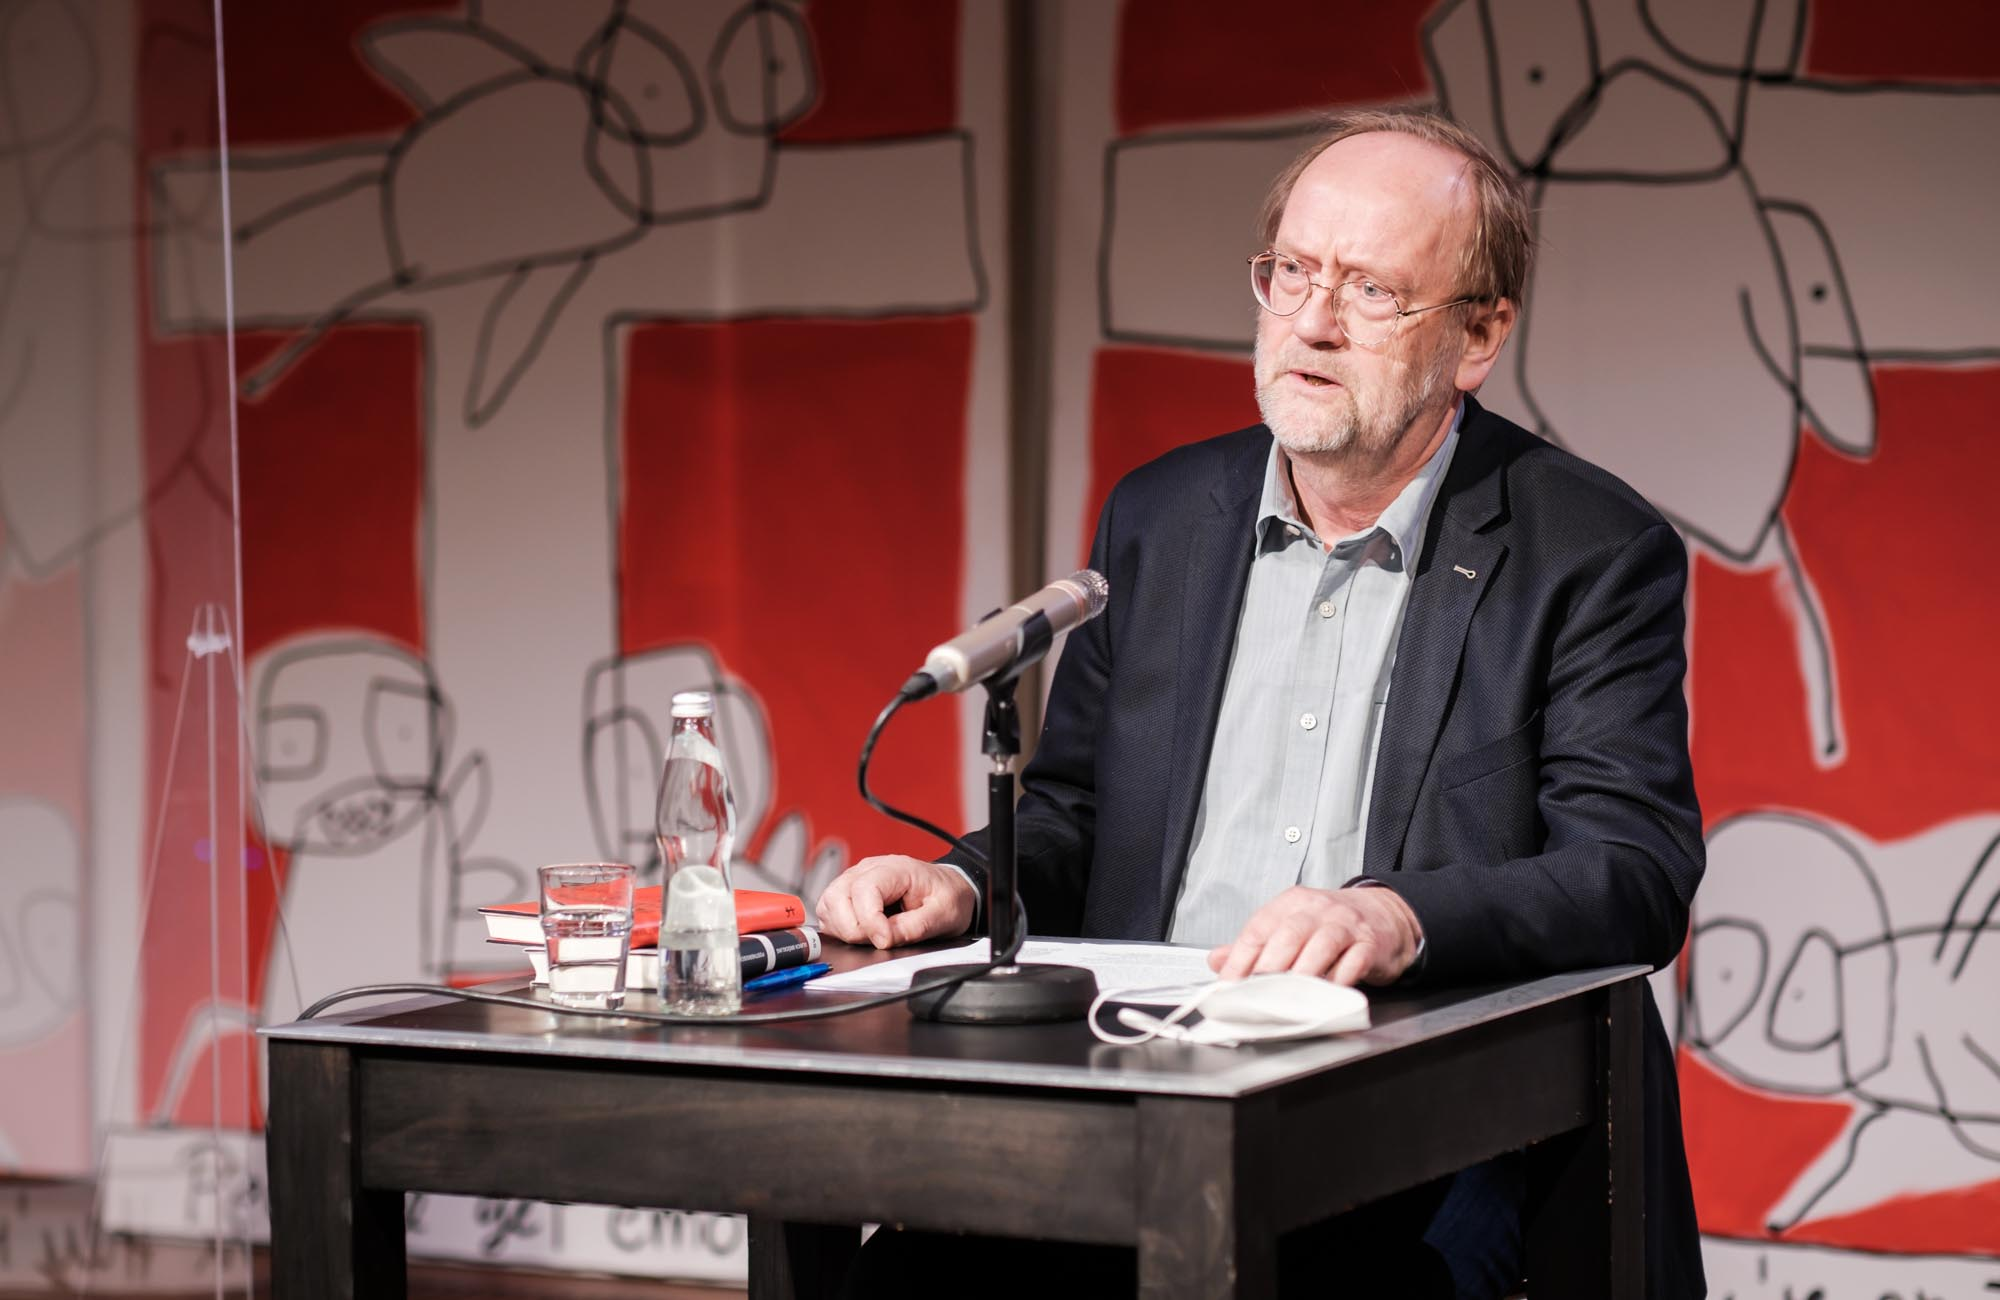 Anne Weber, Ulrich Bröckling: Heldinnen <br/>(c) Sebastian Wenzel